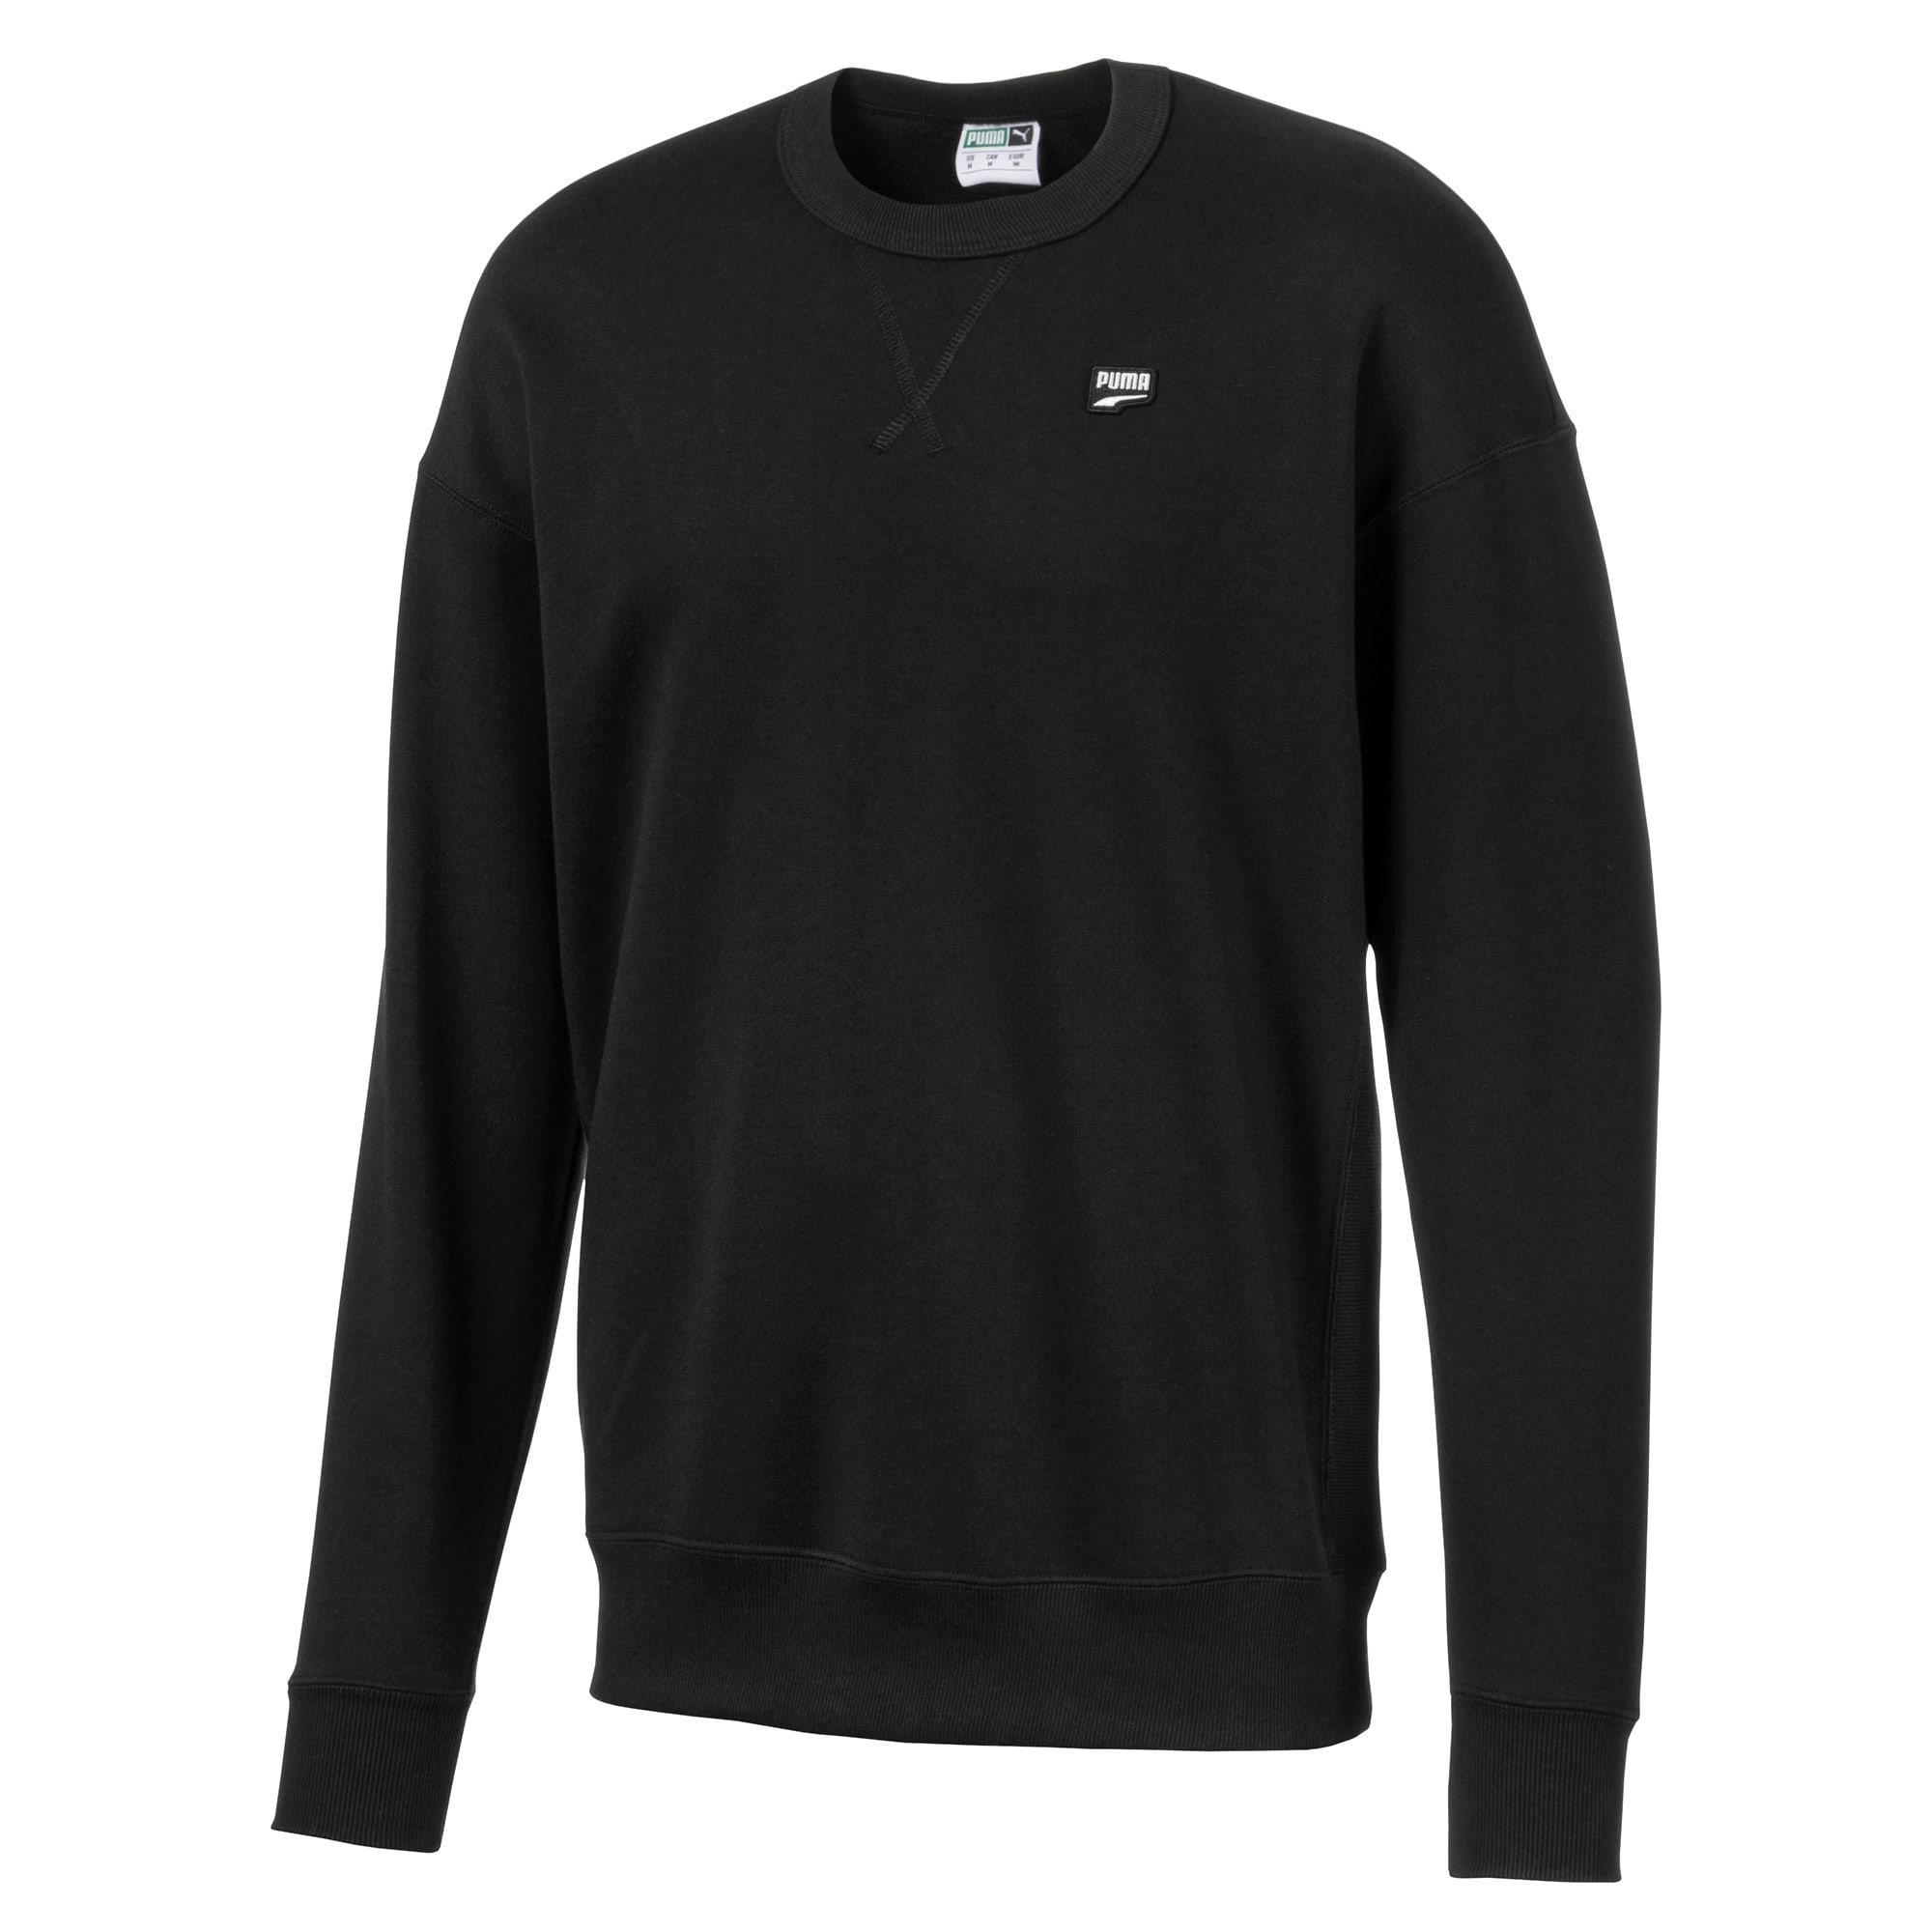 Thumbnail 1 of Downtown Men's Crewneck Sweatshirt, Puma Black, medium